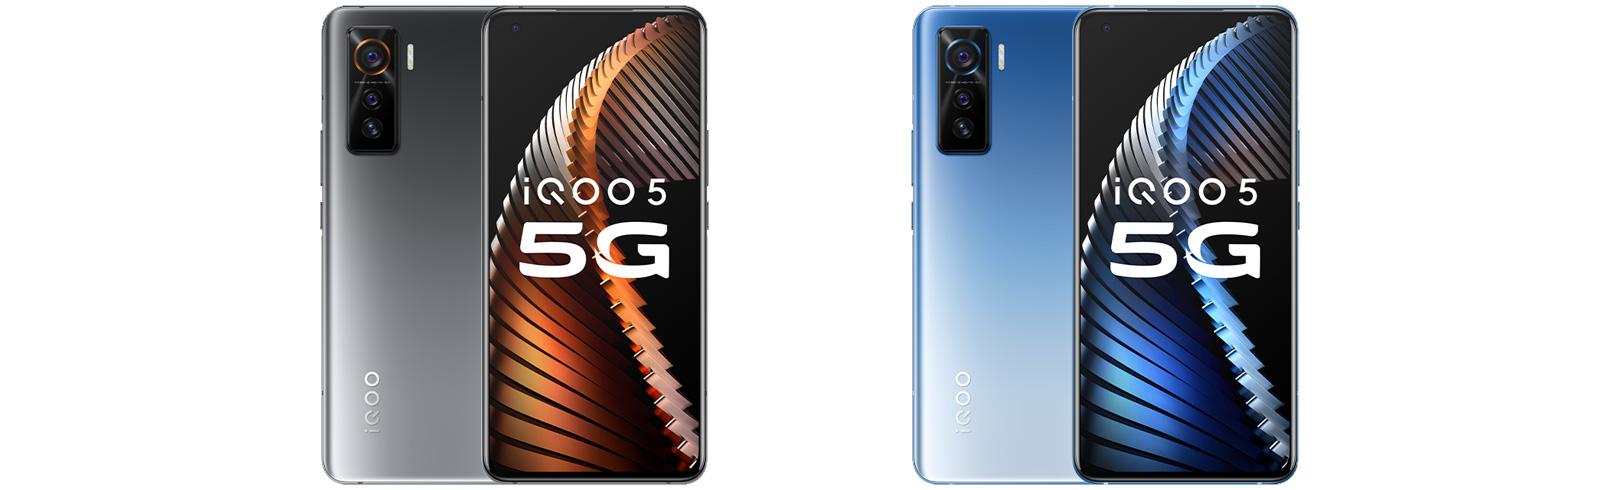 "Vivo unveiled the iQOO 5 and iQOO 5 Pro with Snapdragon 865, 6.56"" AMOLED displays"